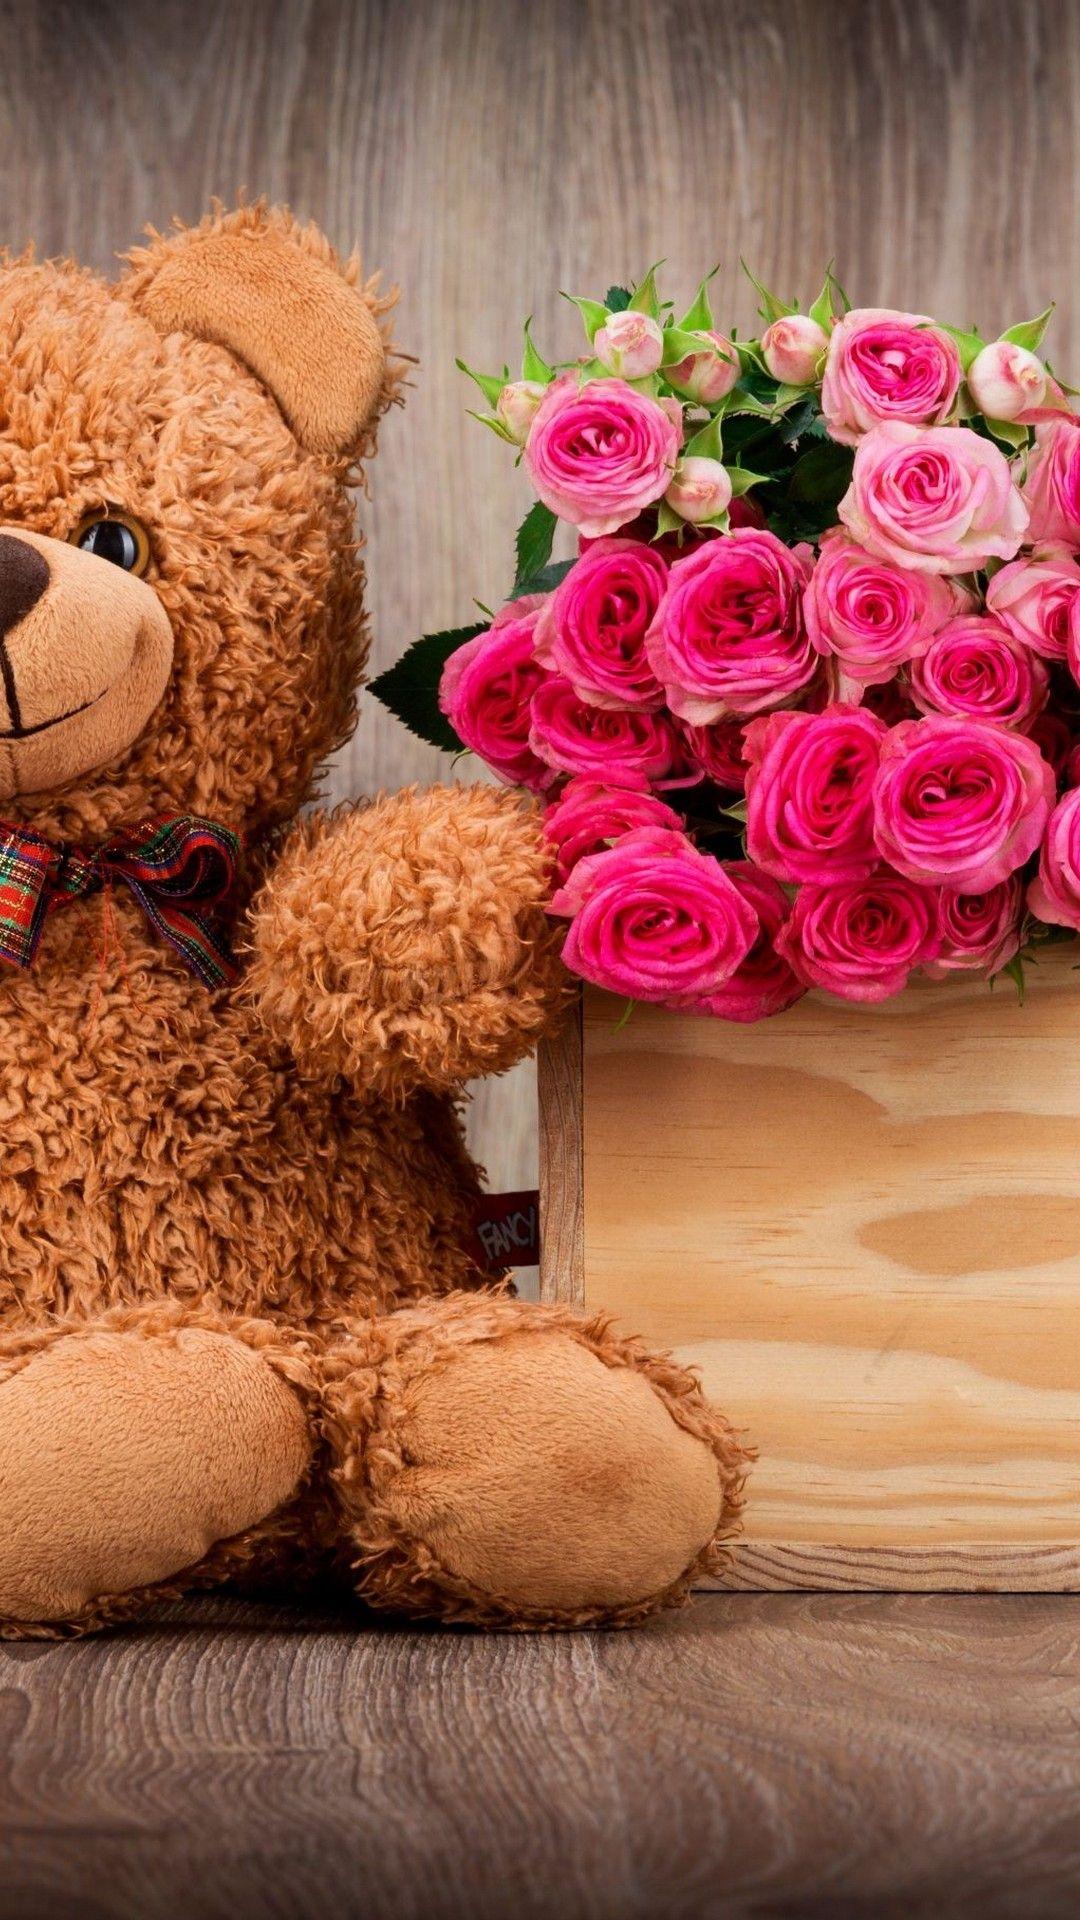 Teddy Bear Giant Wallpaper Iphone